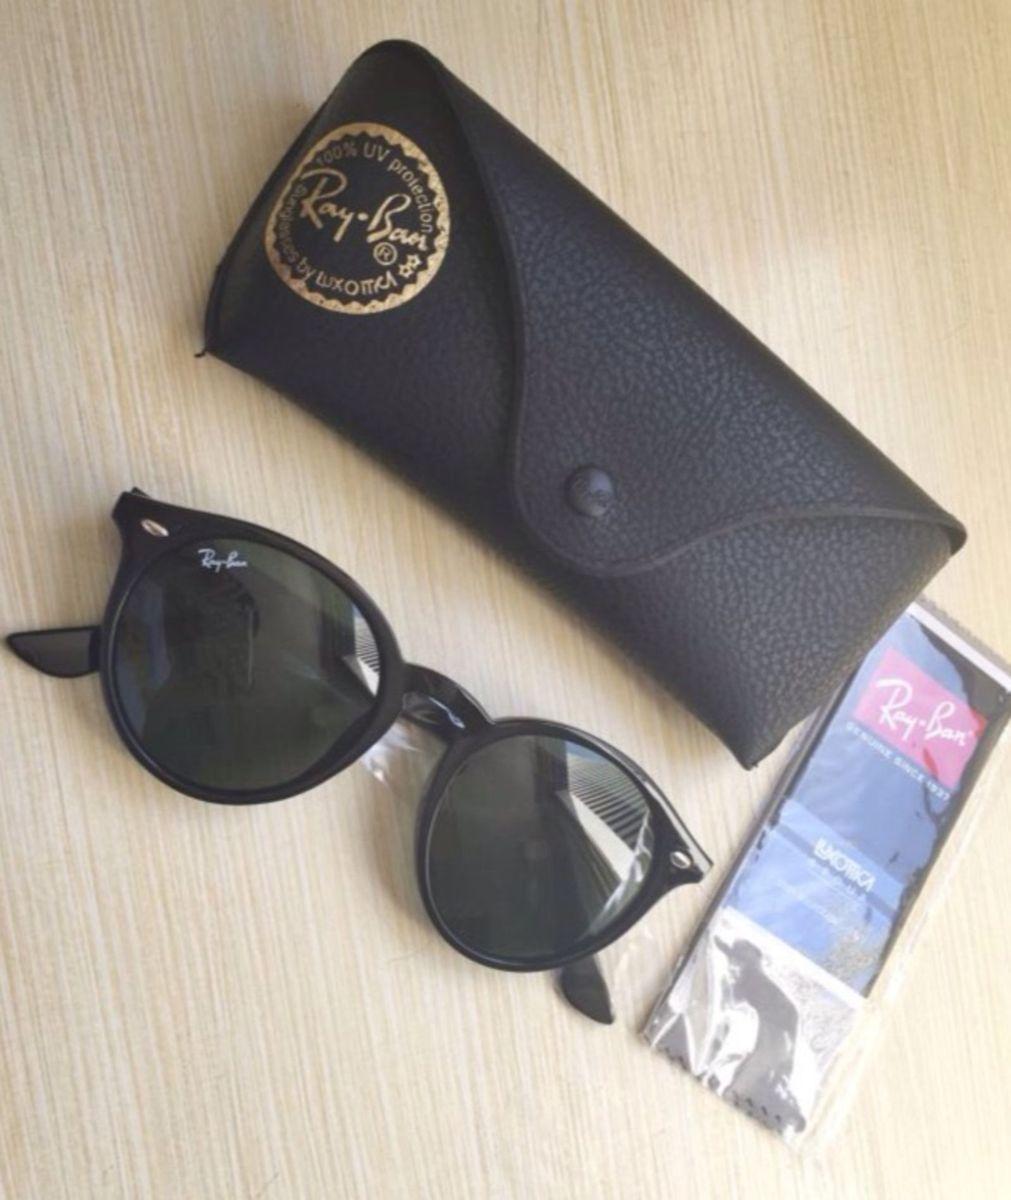 a963cb703e0ad ray ban highstreet preto - óculos ray ban.  Czm6ly9wag90b3muzw5qb2vplmnvbs5ici9wcm9kdwn0cy81mjgxnzy0lzi5zmizm2fimdg0odkxodi5nmi2yji1n2jmodm0mzm1lmpwzw  ...